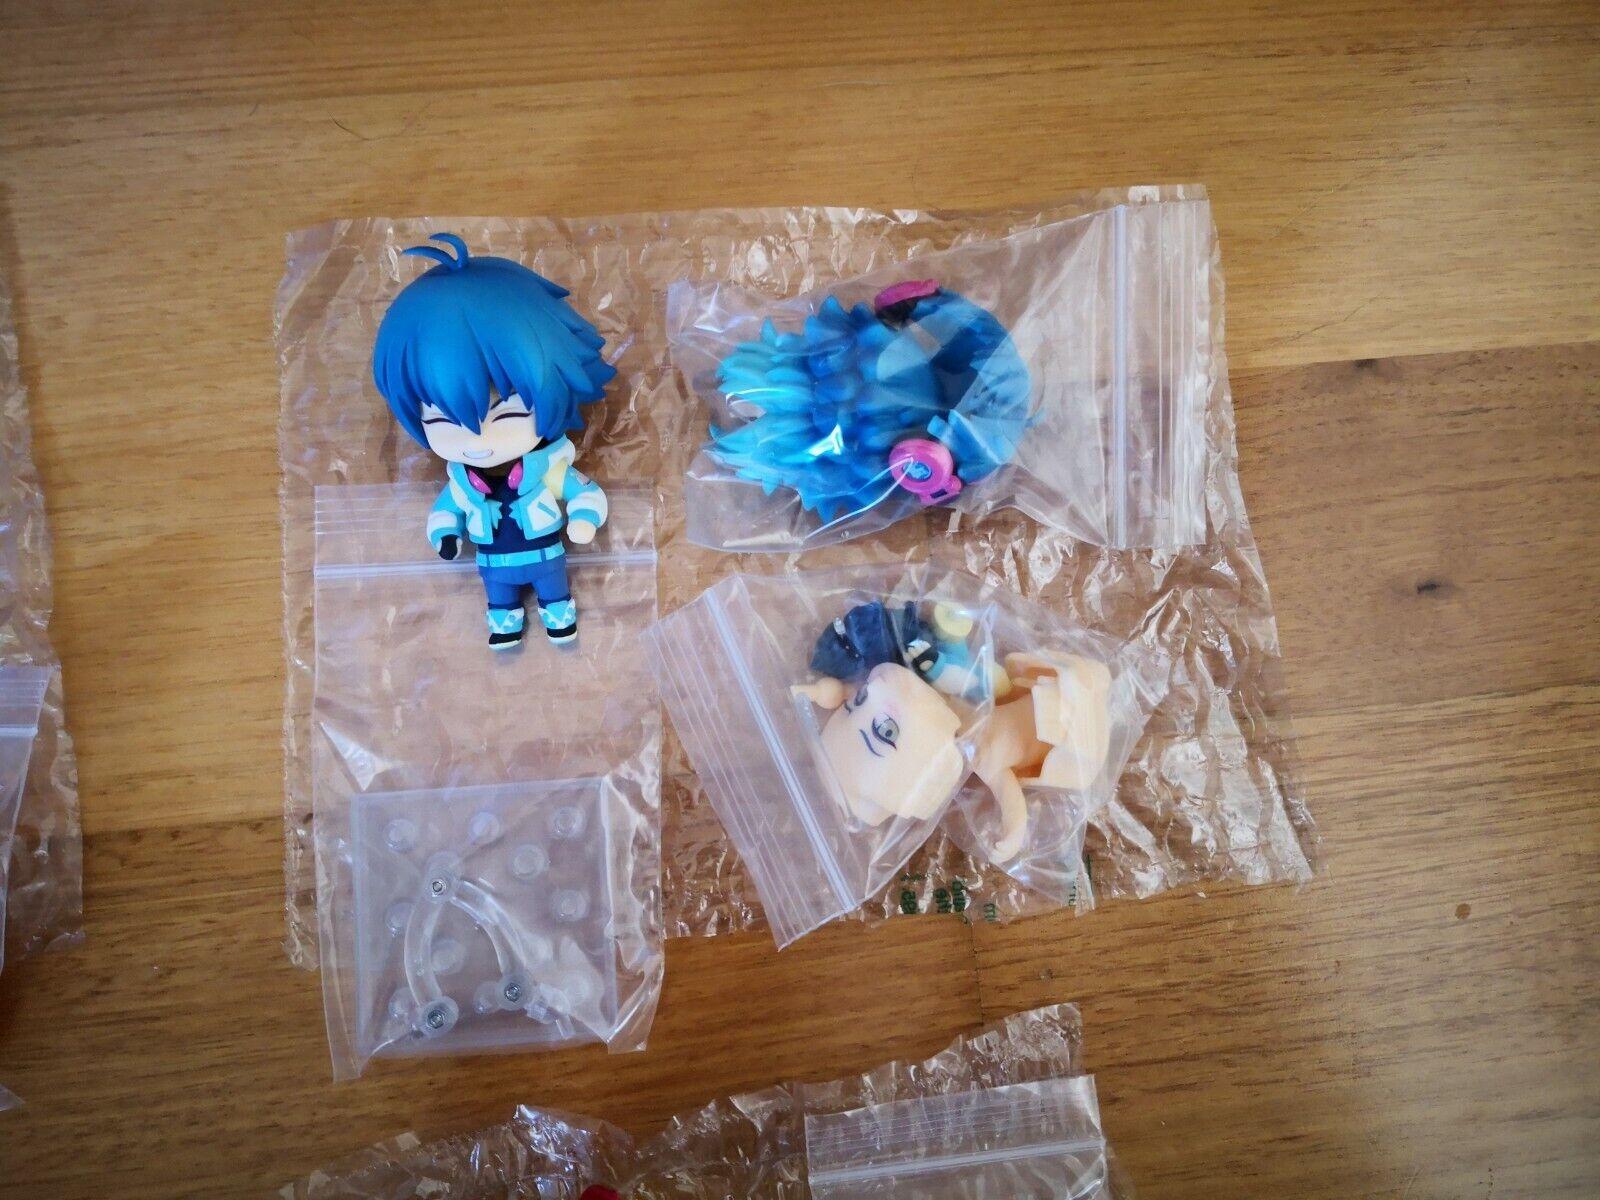 Nendoroid DRAMAtical Murder Seragaki Aoba & Ren   418 USED NO scatola  produttori fornitura diretta